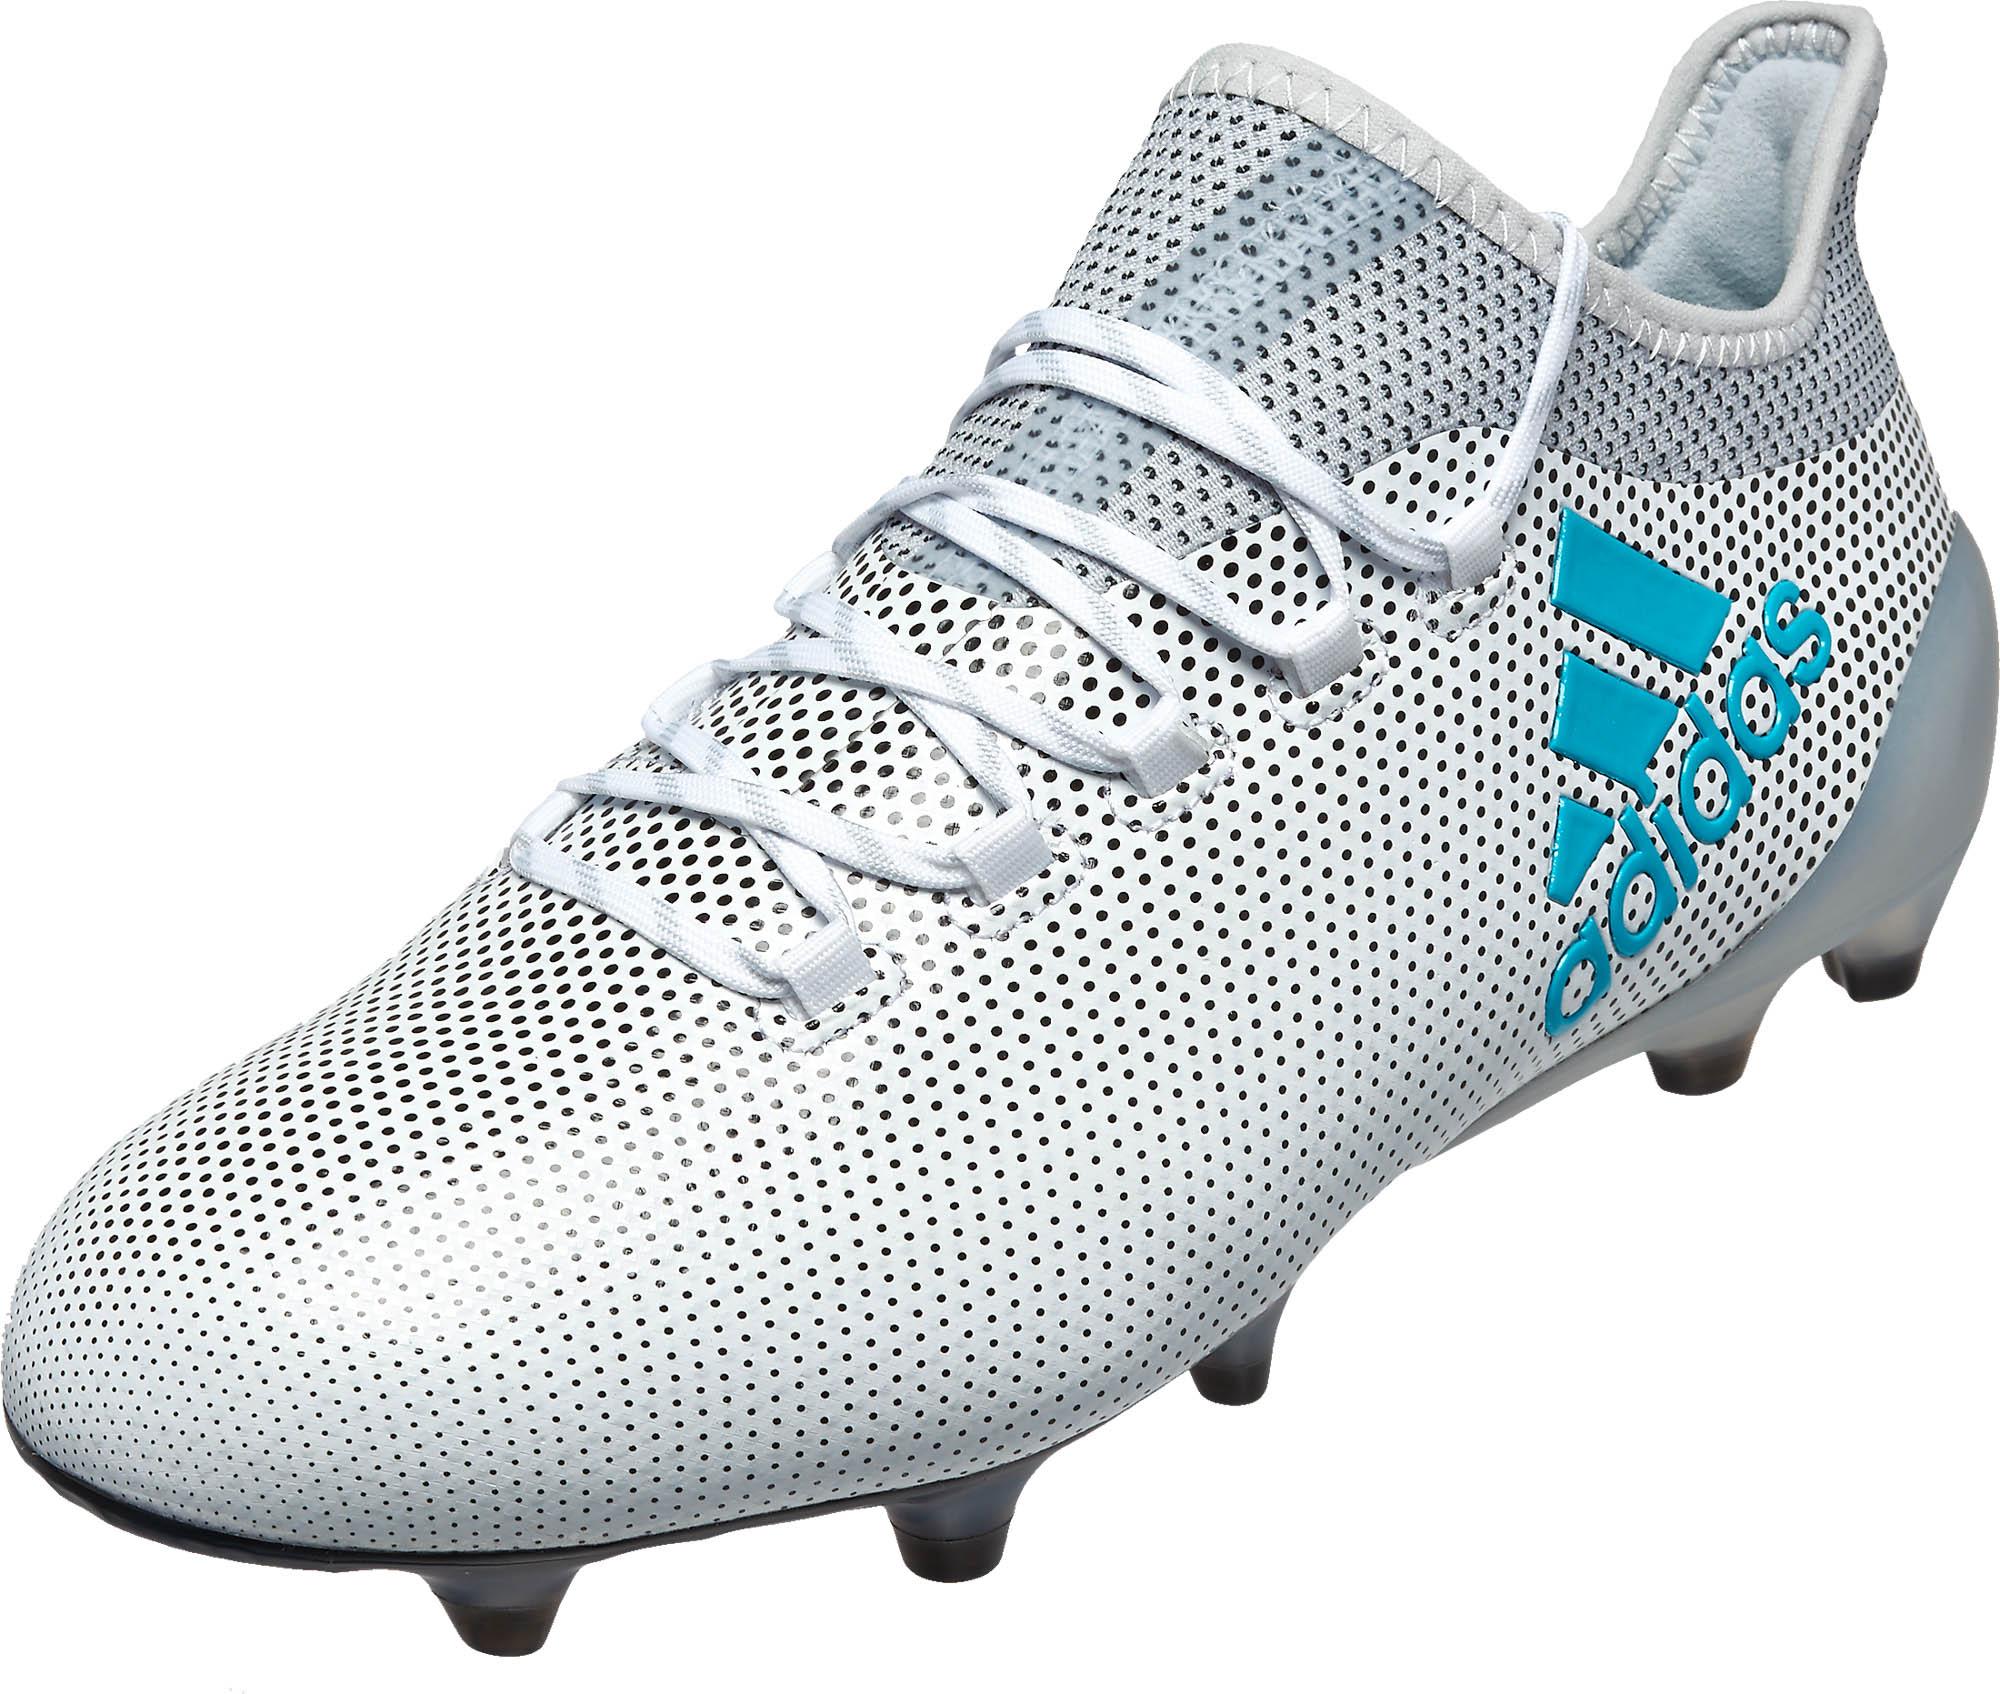 pretty nice c8166 f038a adidas X 17.1 FG – White/Energy Blue